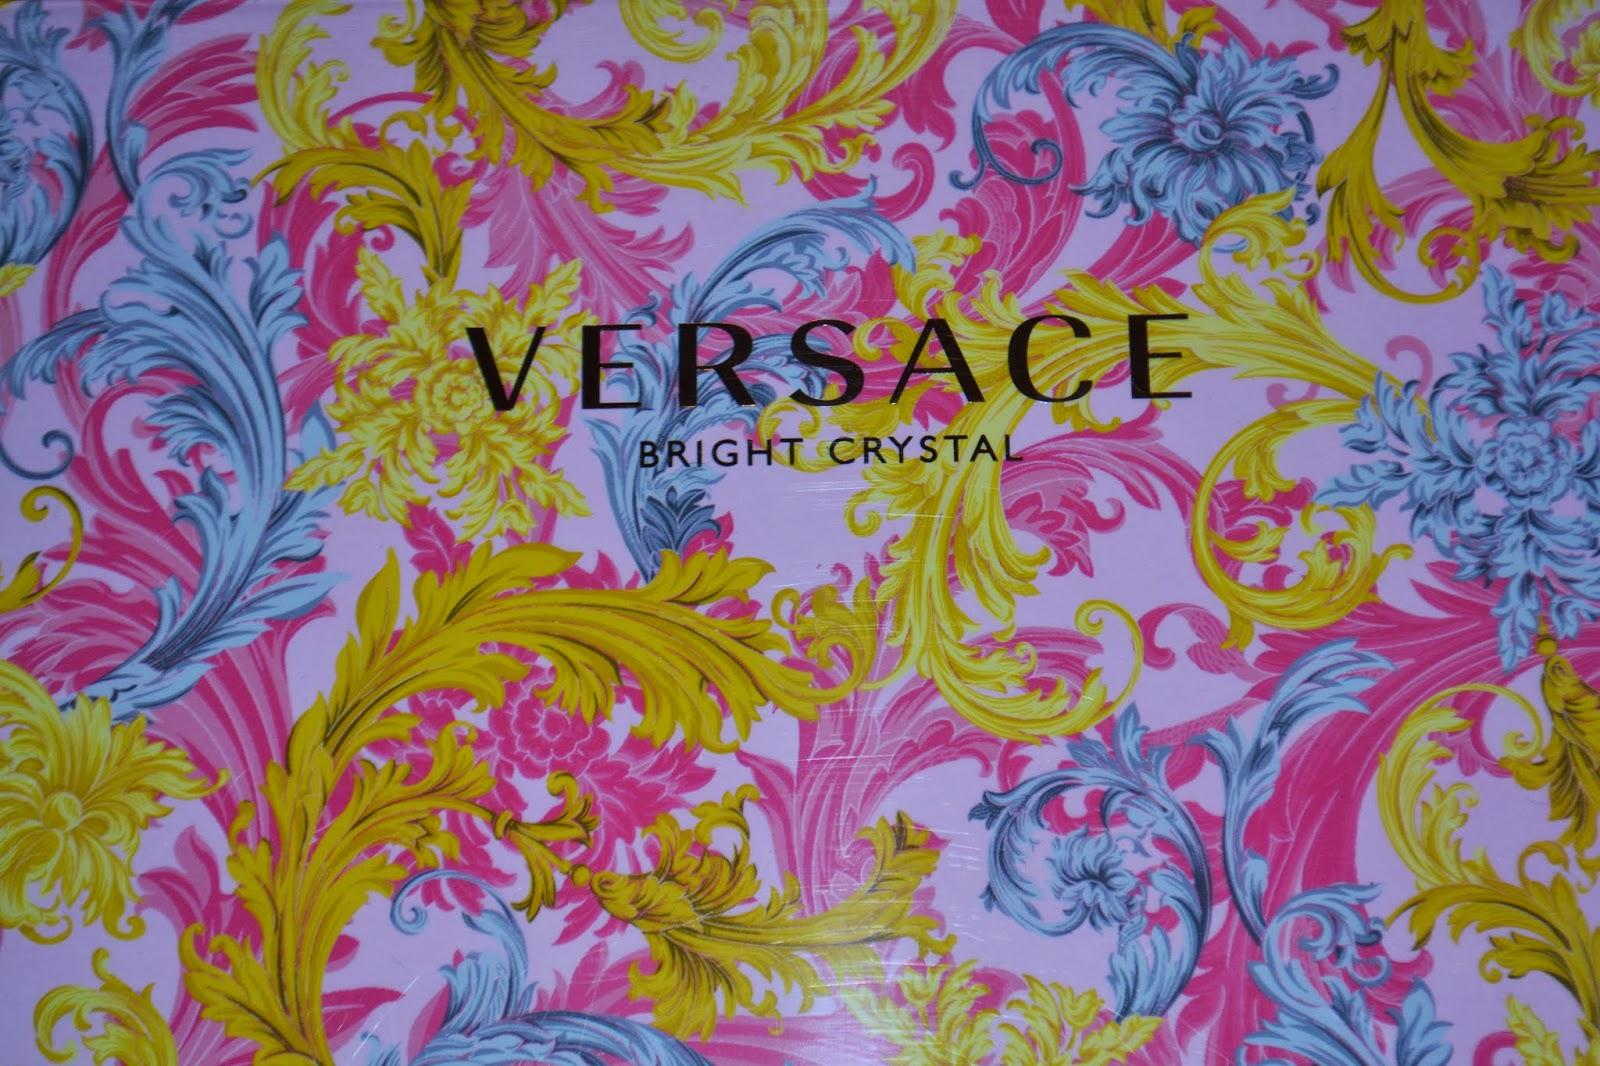 versace pattern wallpaper - photo #39